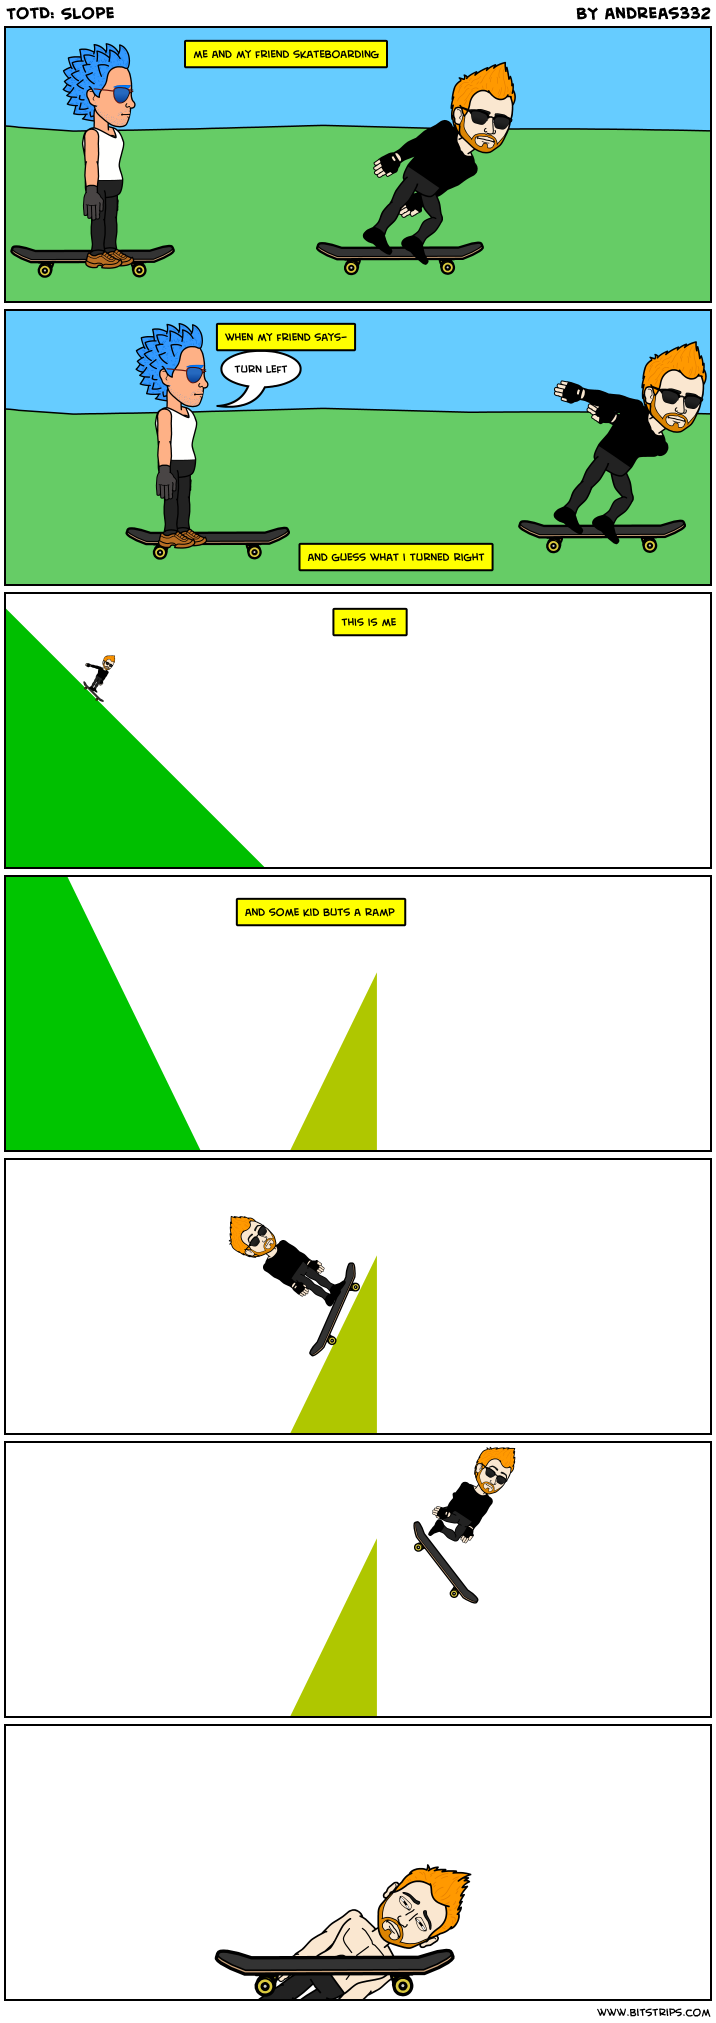 TotD: Slope